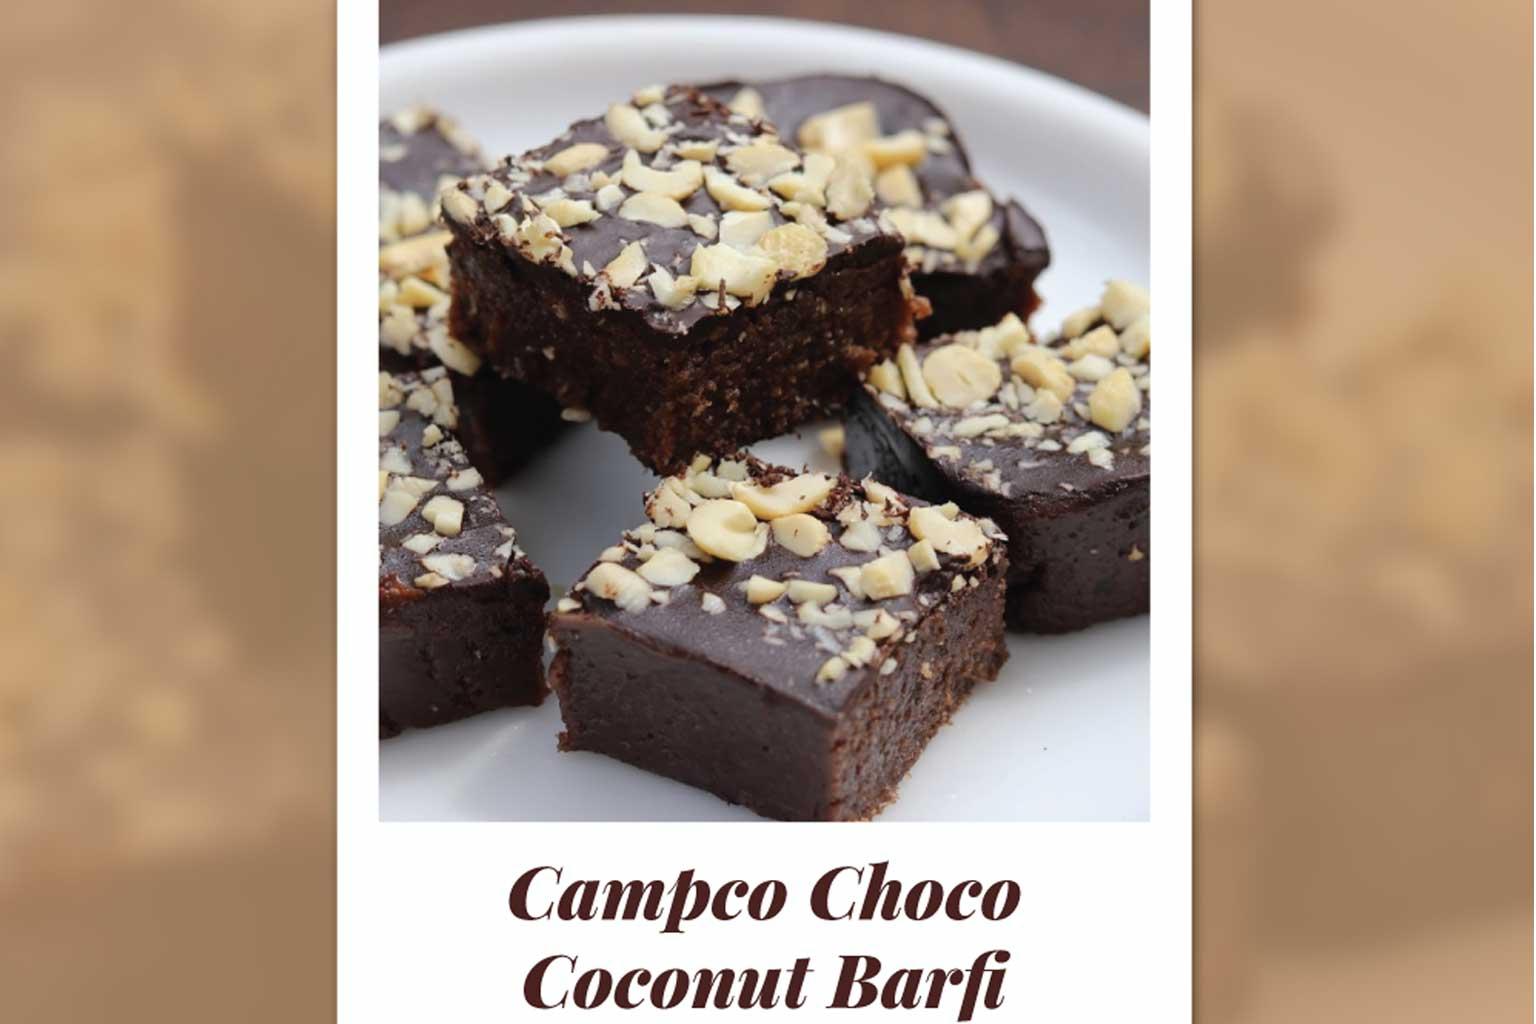 campco choco coconut barfi